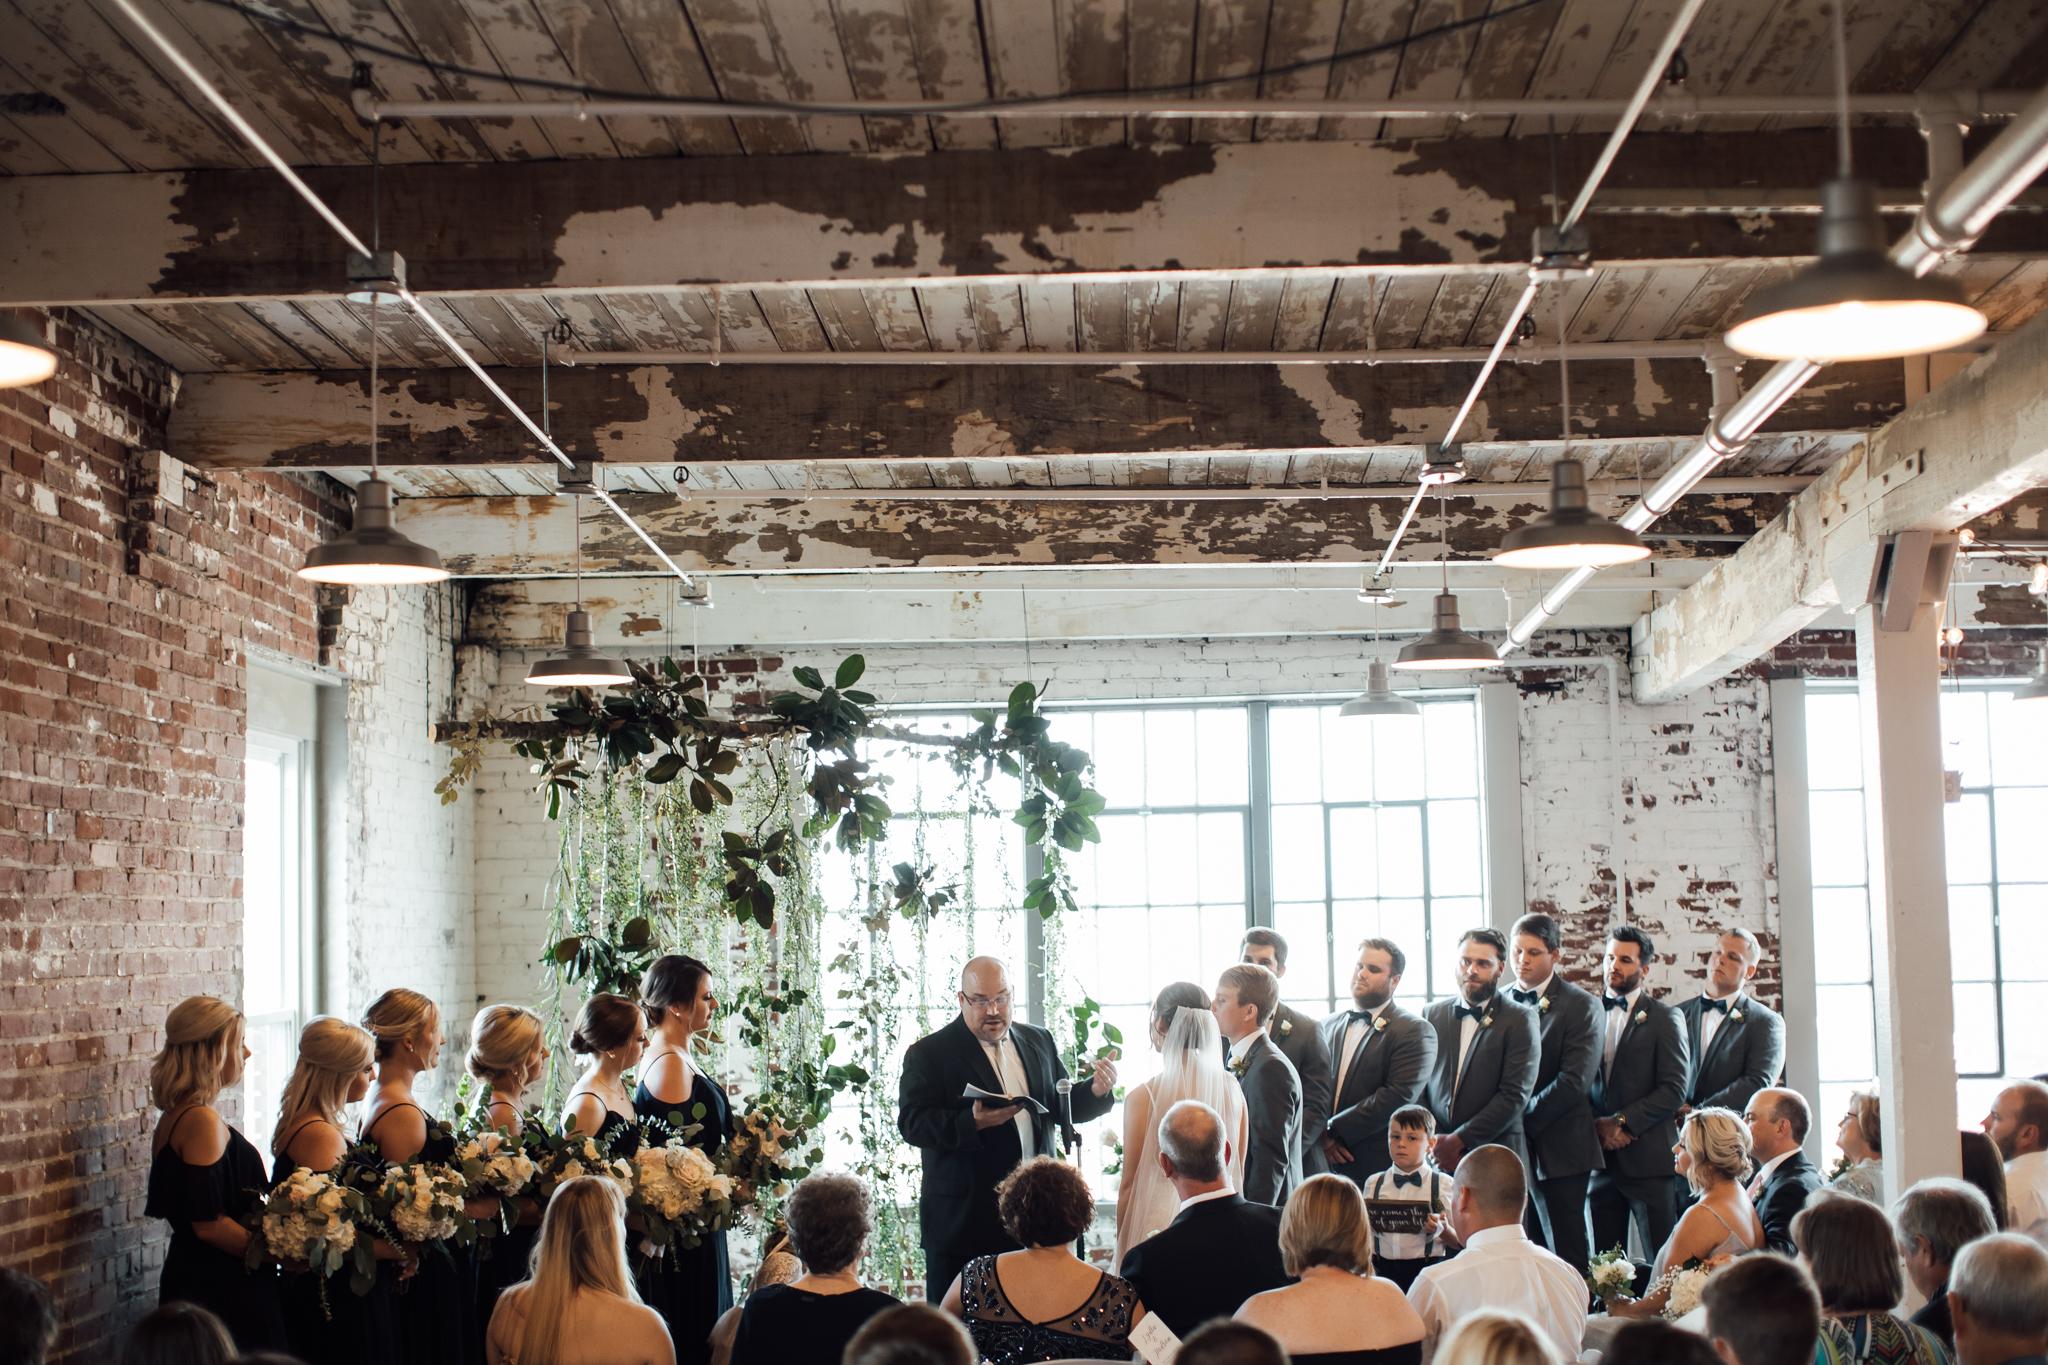 409smain-downtown-memphis-wedding-venue-thewarmtharoundyou (91 of 243).jpg